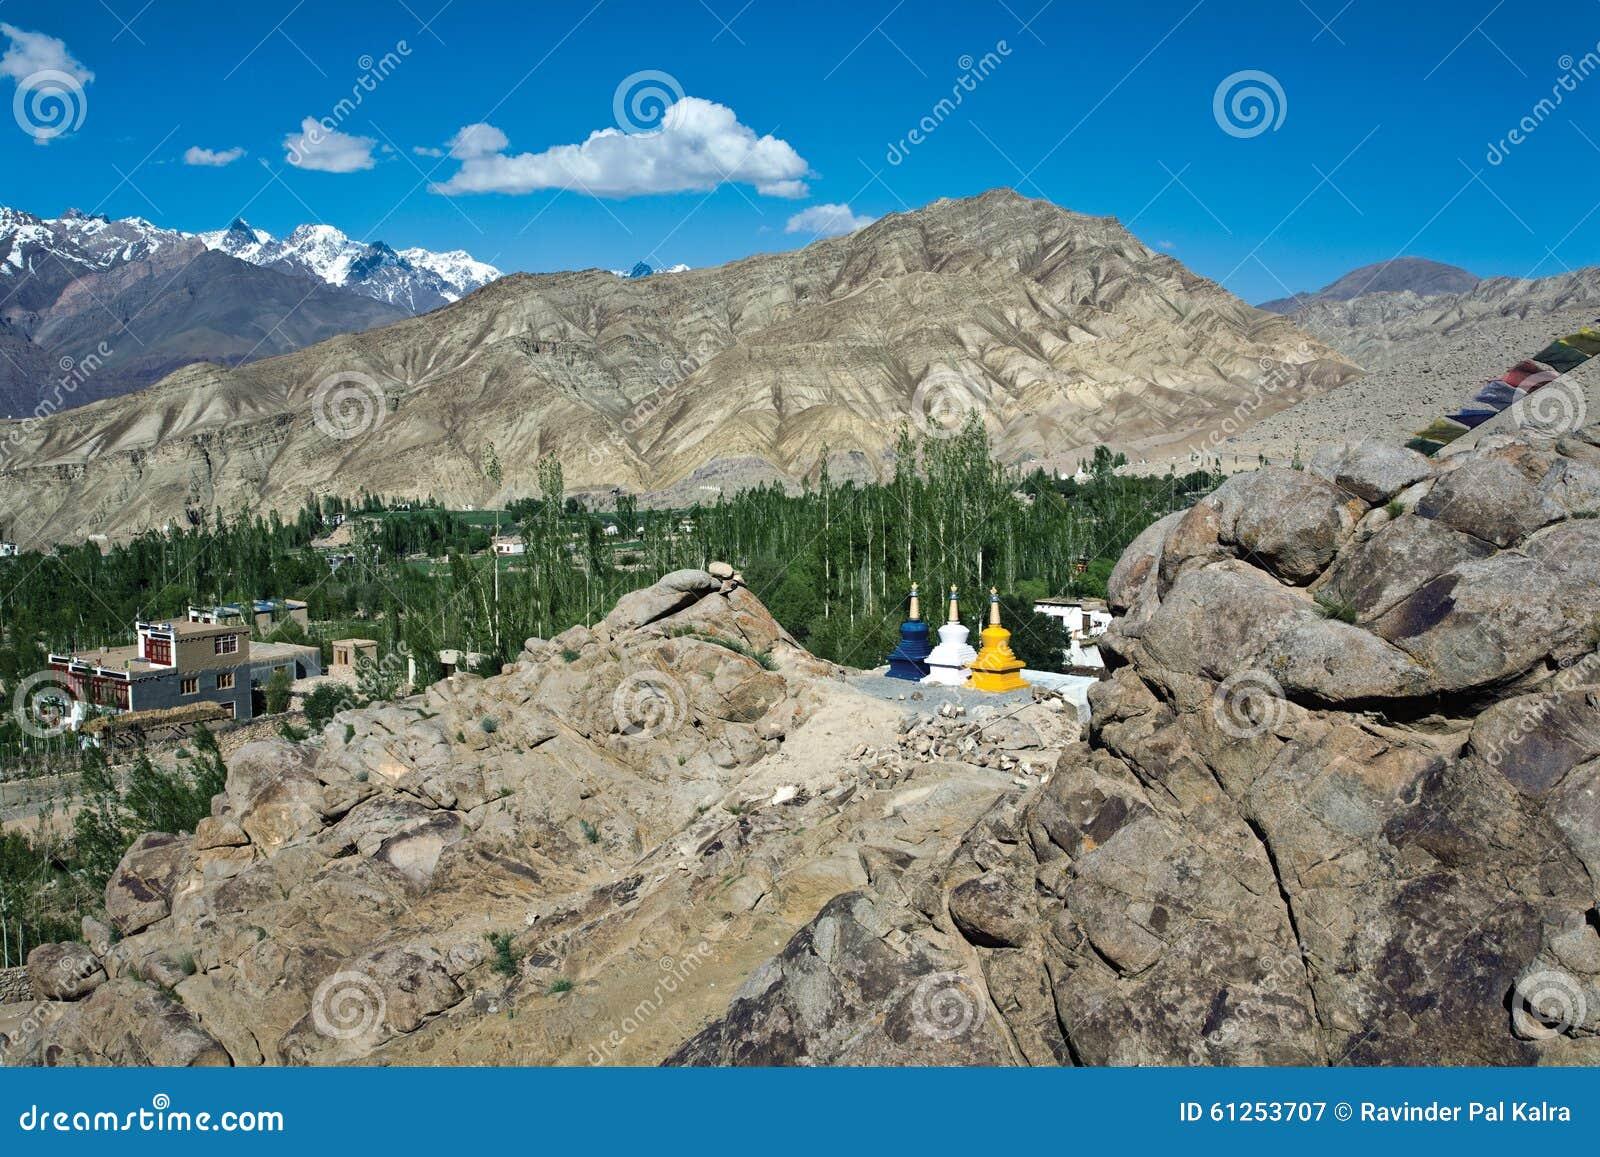 Un paisaje cerca del monasterio de Likir, Ladakh, Jammu y Cachemira, la India